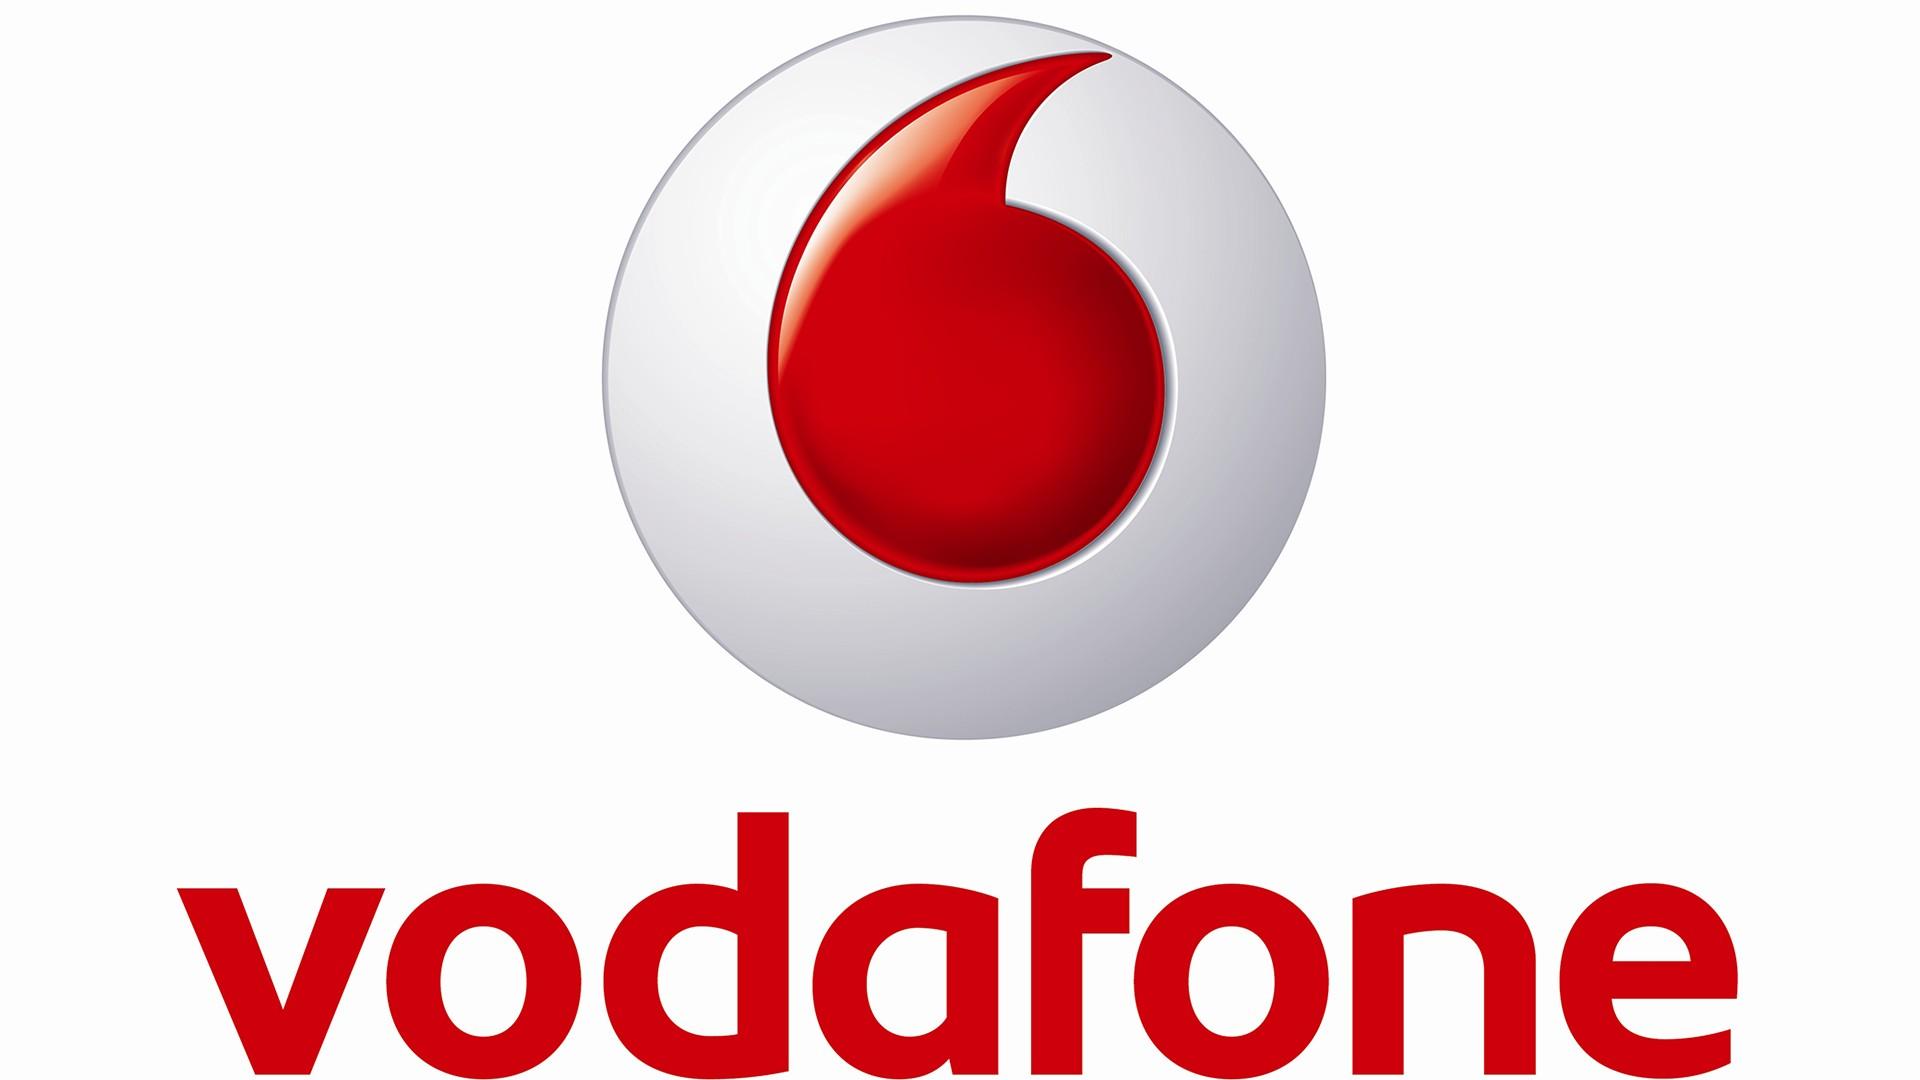 Vodafone Logo Wallpaper.